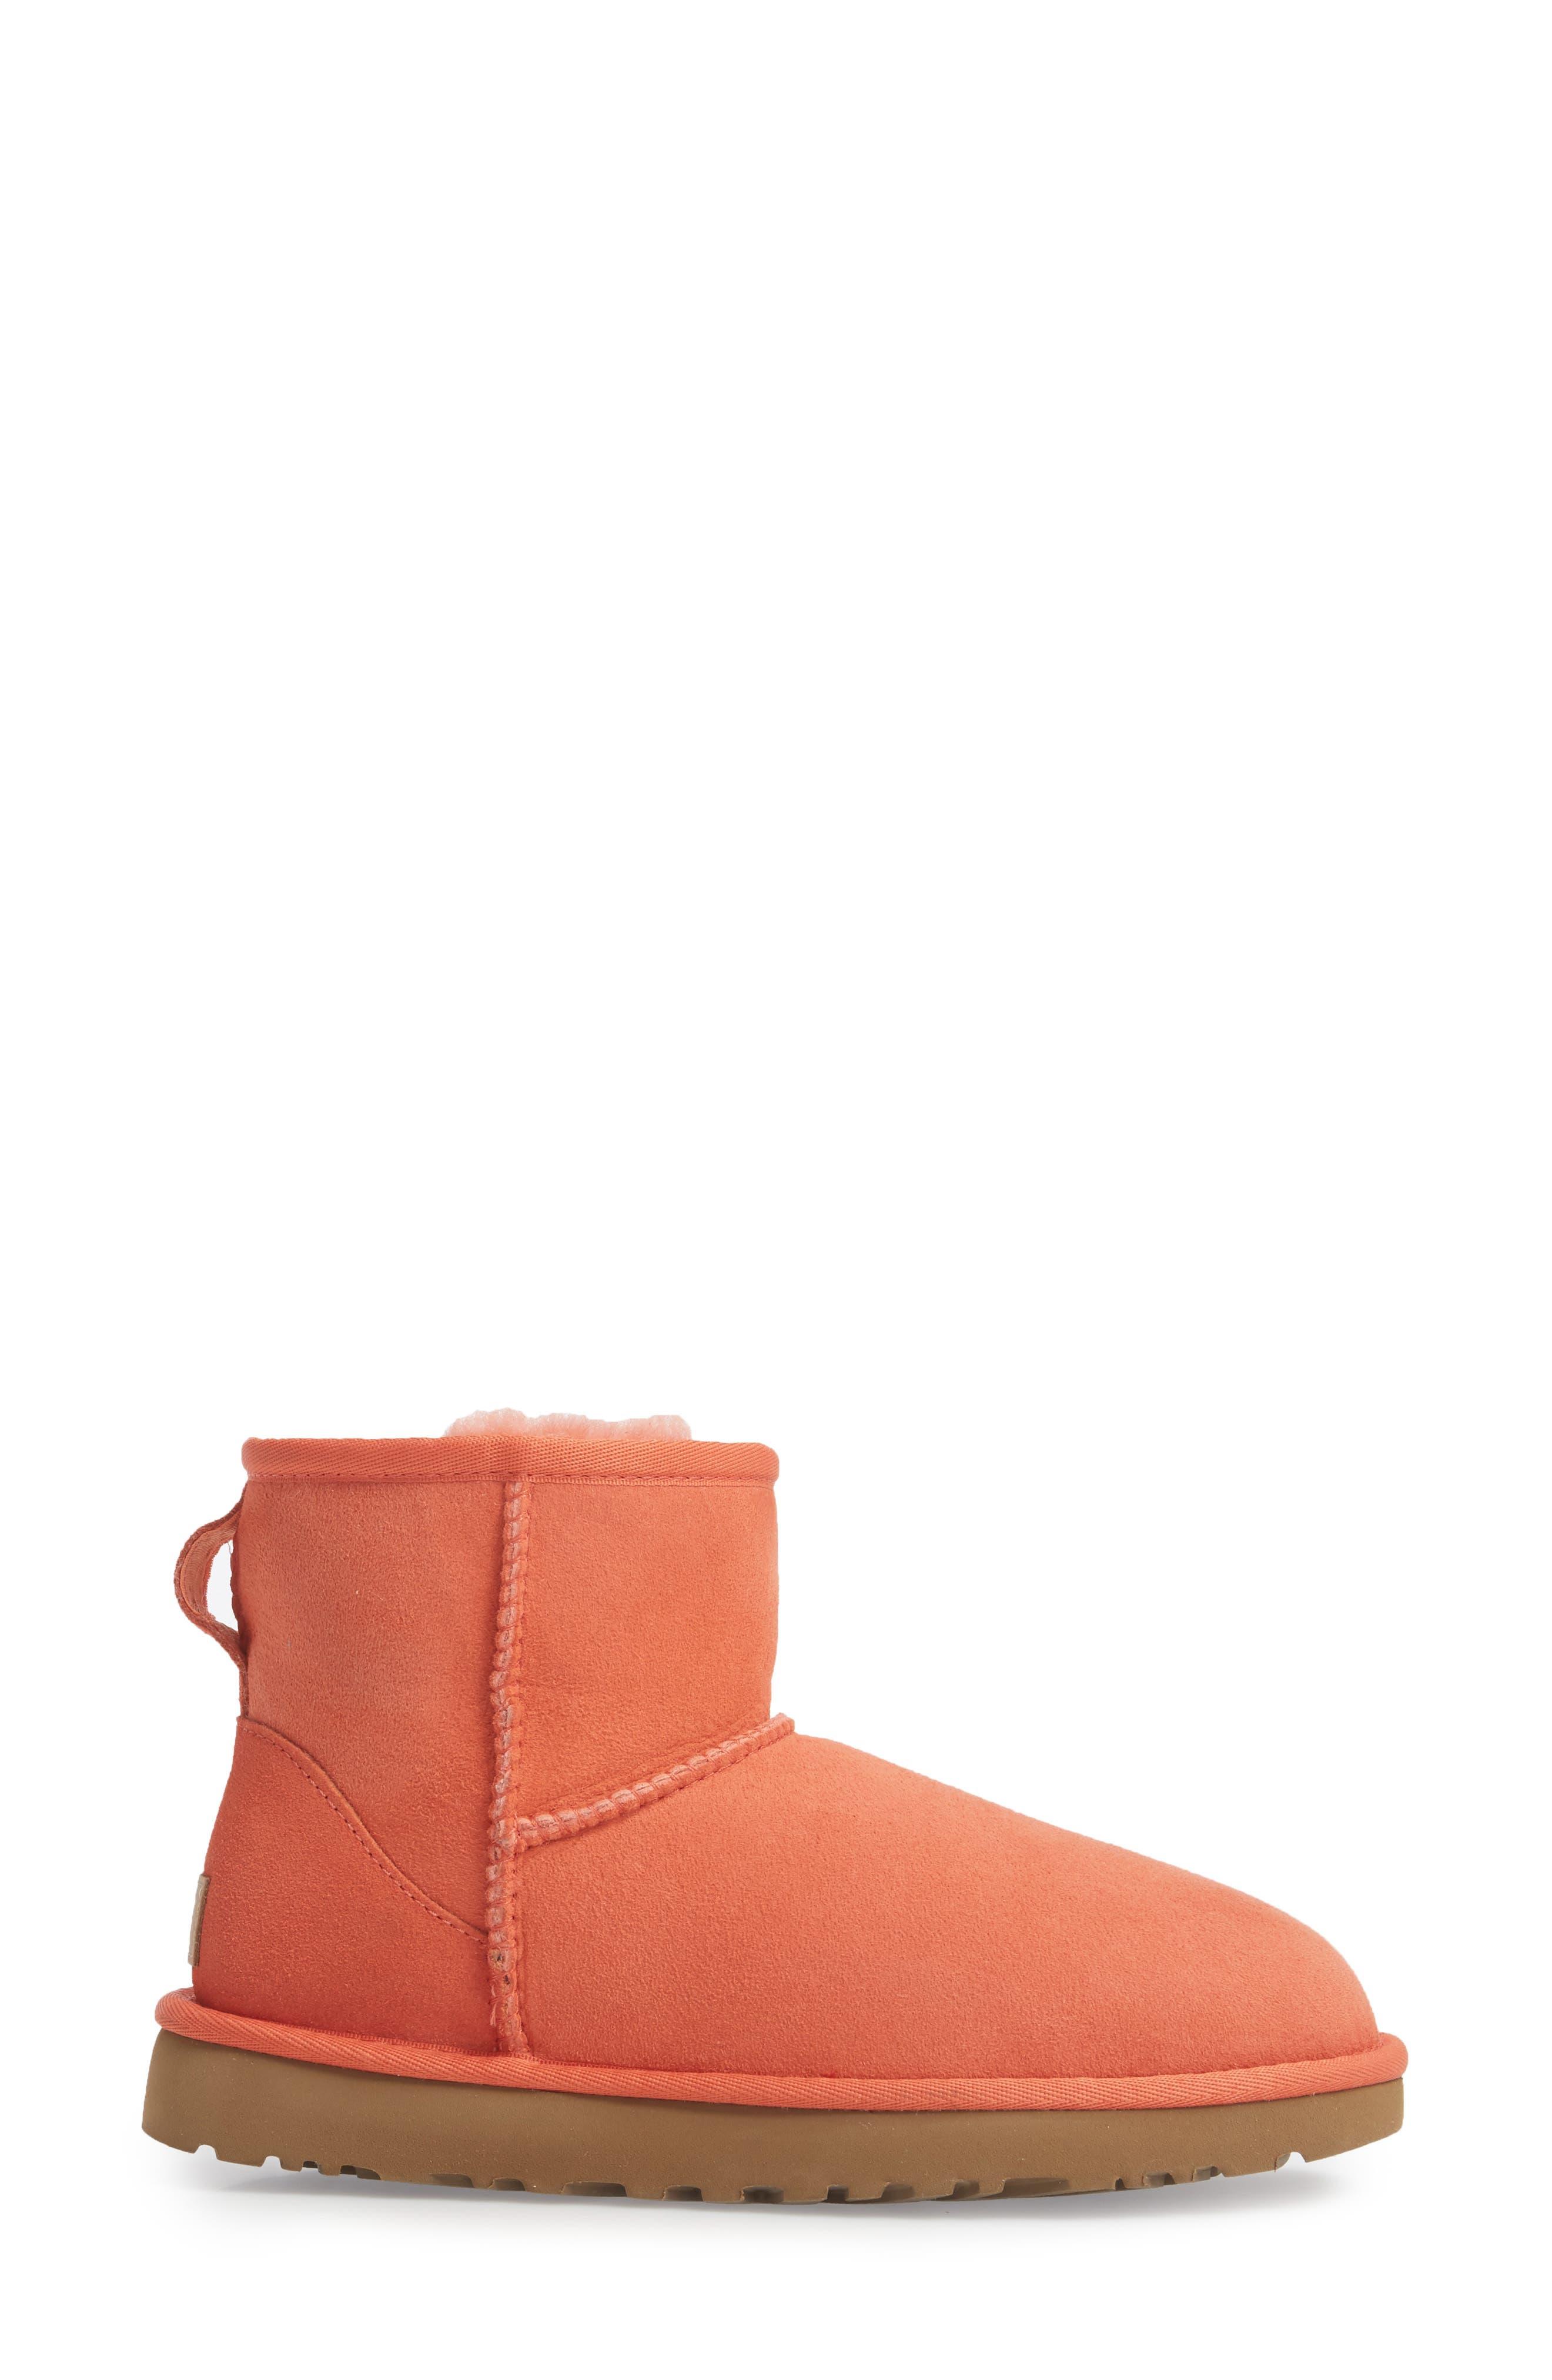 ,                             Classic Mini II Genuine Shearling Lined Boot,                             Alternate thumbnail 91, color,                             834